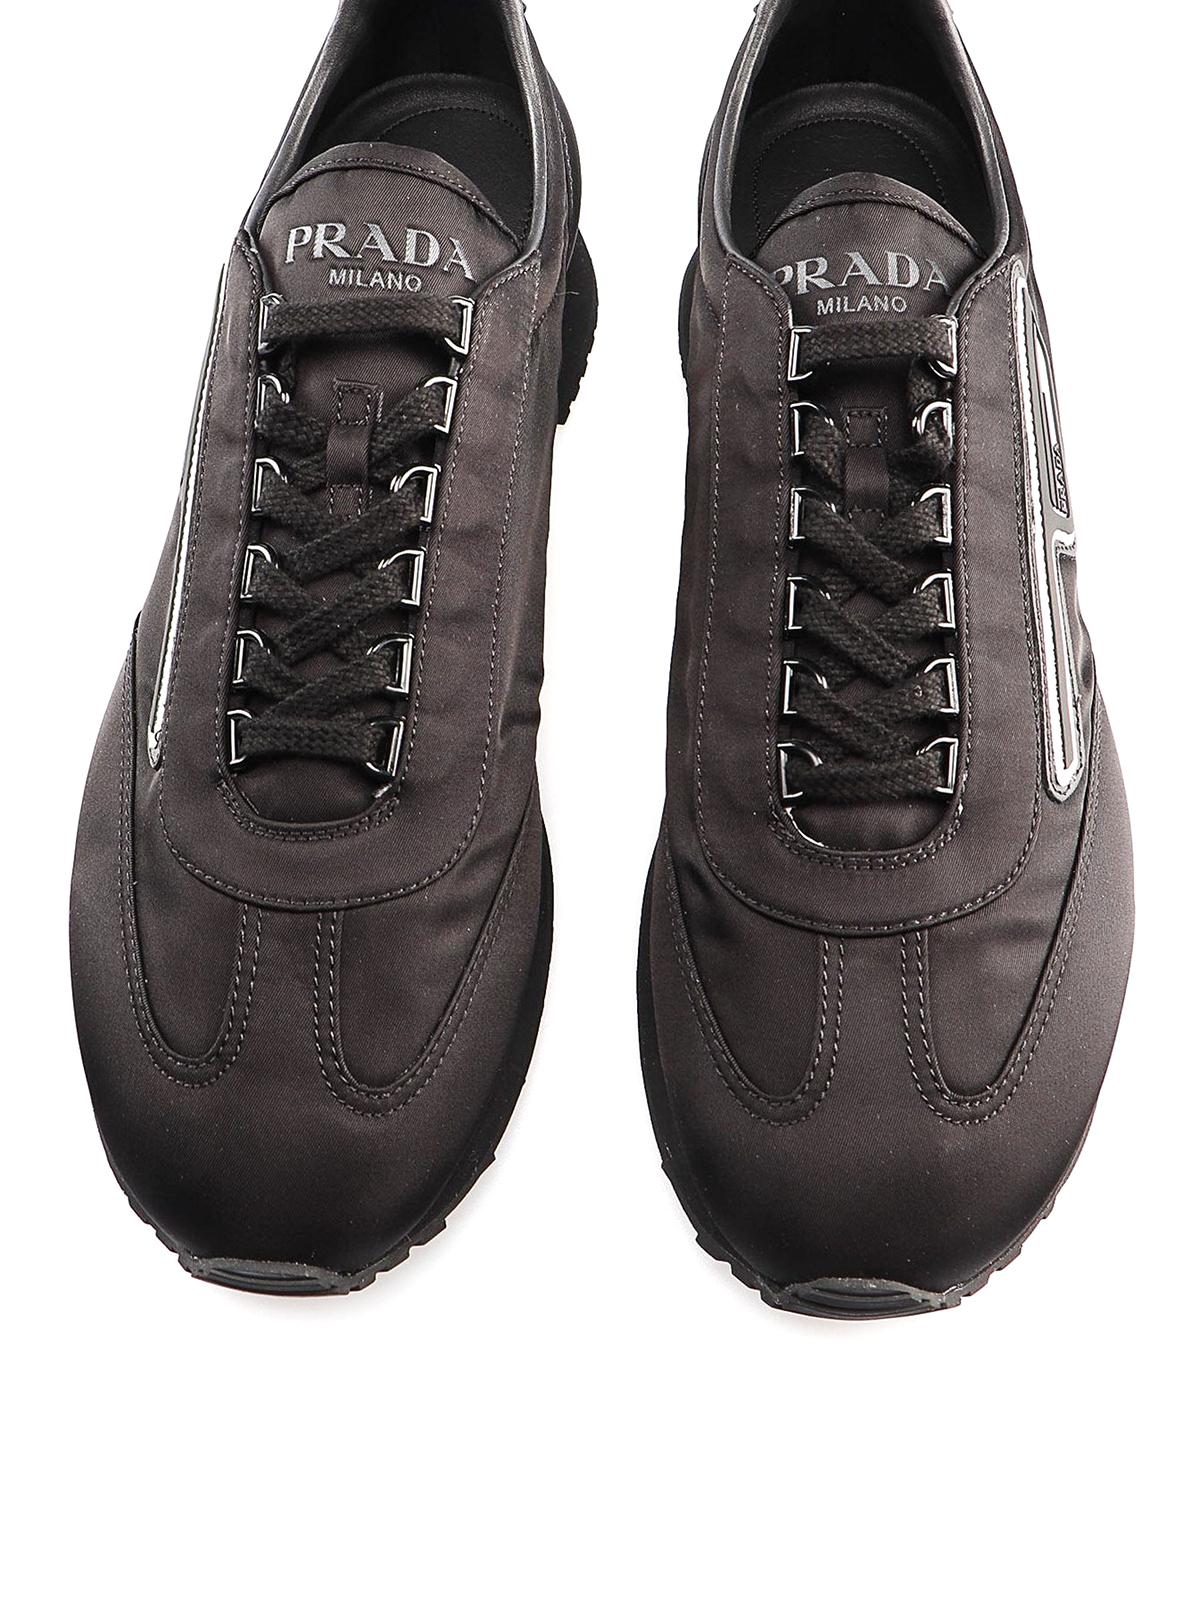 Prada - Milano 70 nylon sneakers